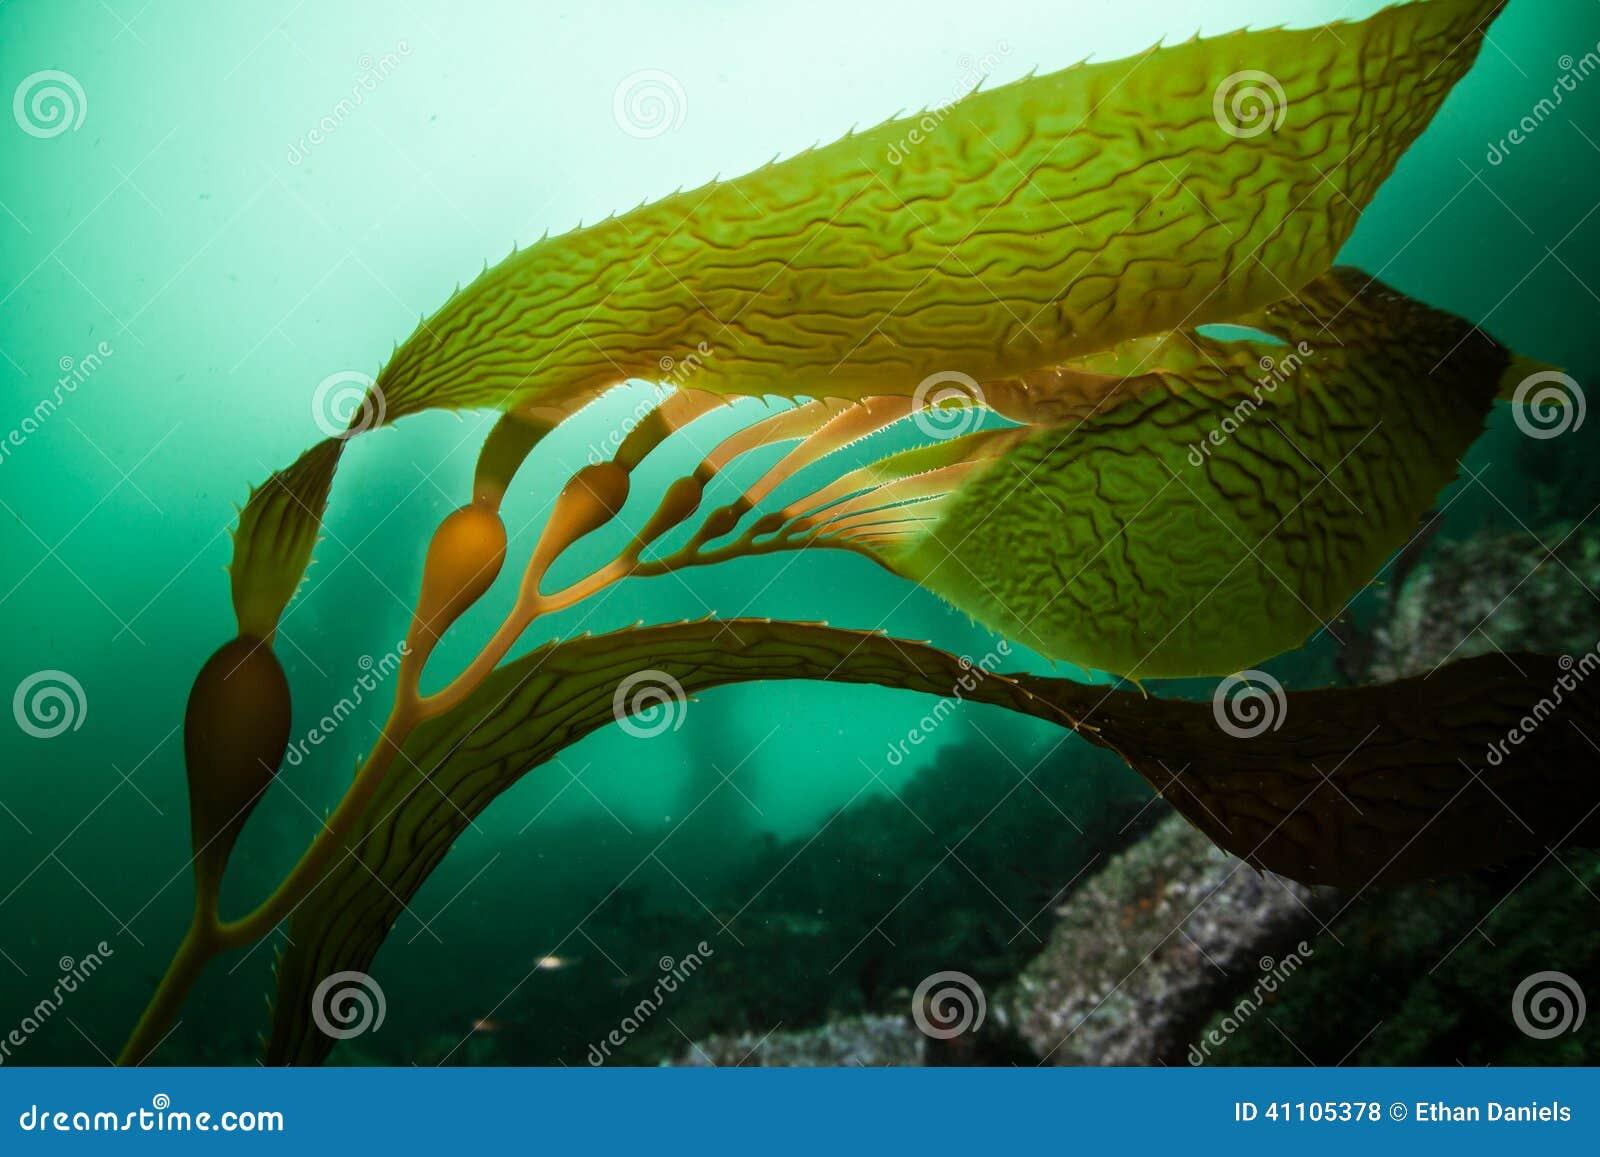 Gas Prices In California >> Giant Kelp 3 Stock Photo - Image: 41105378